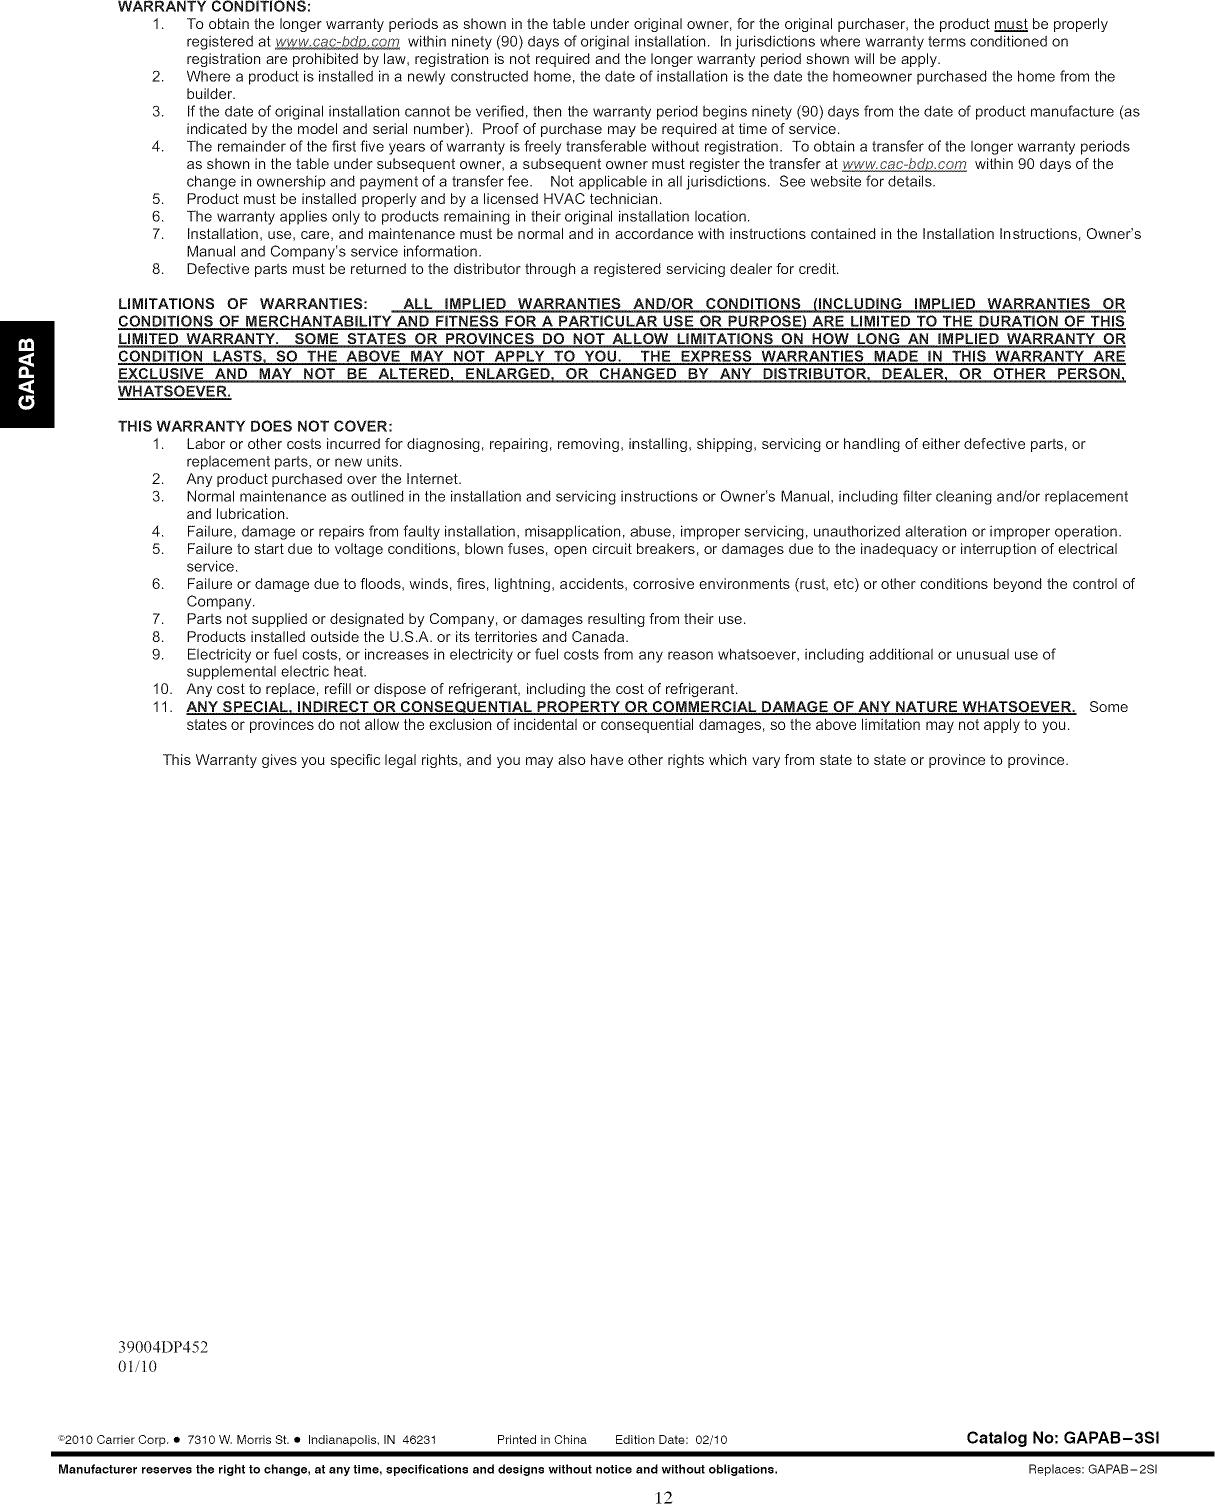 CARRIER Air Cleaner Manual L1003417